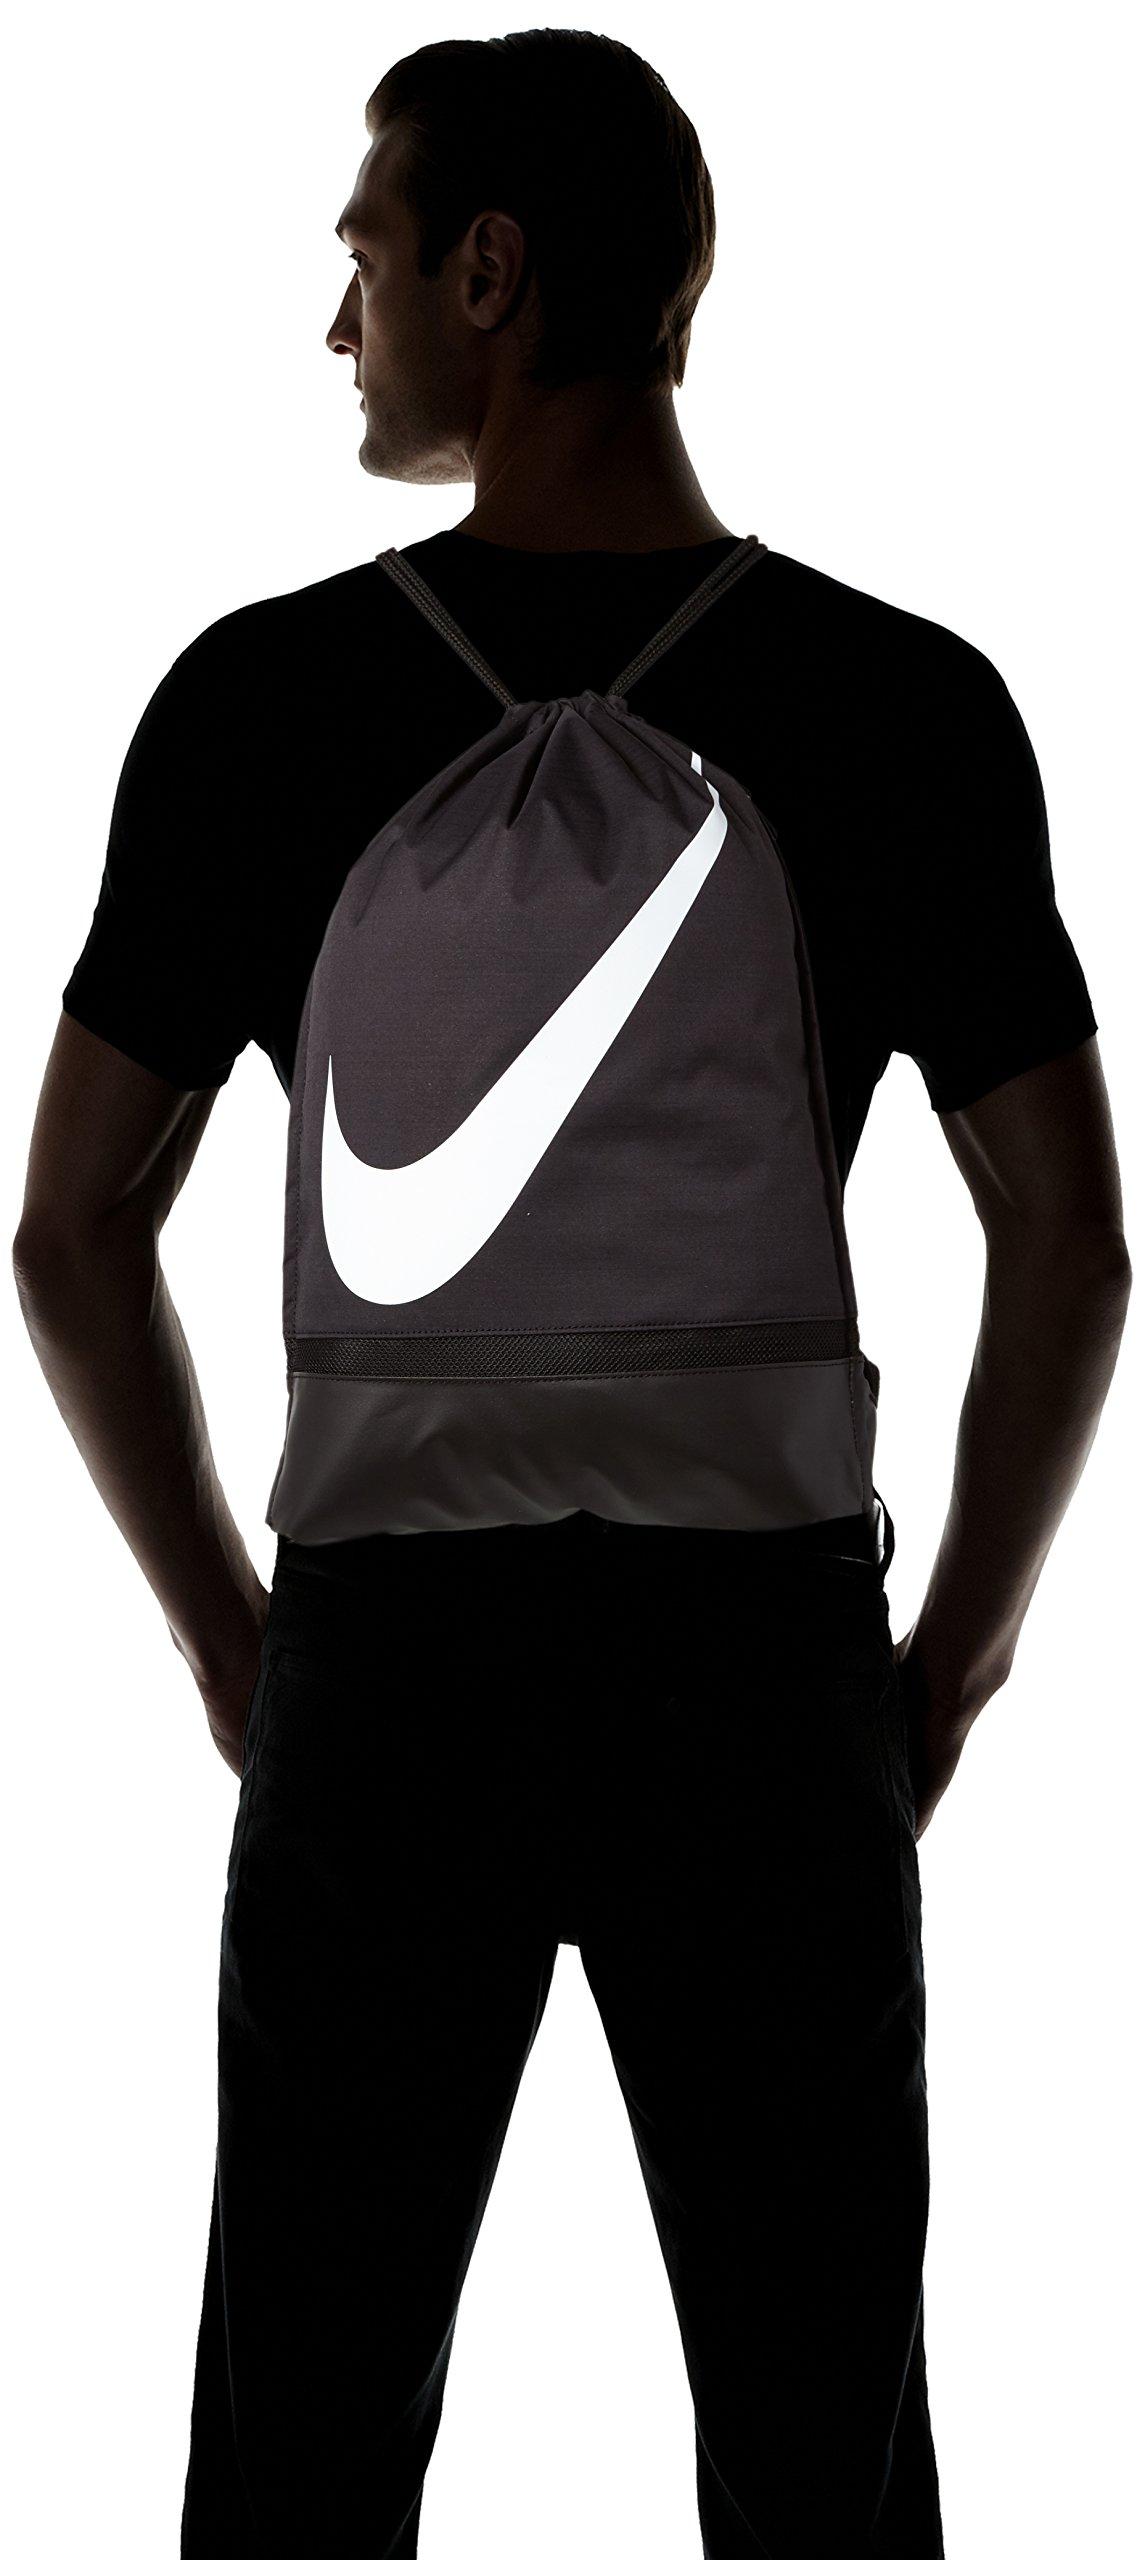 71peguehJRL - Nike Gymsack Saco de Gimnasia De Fútbol, Unisex Adulto